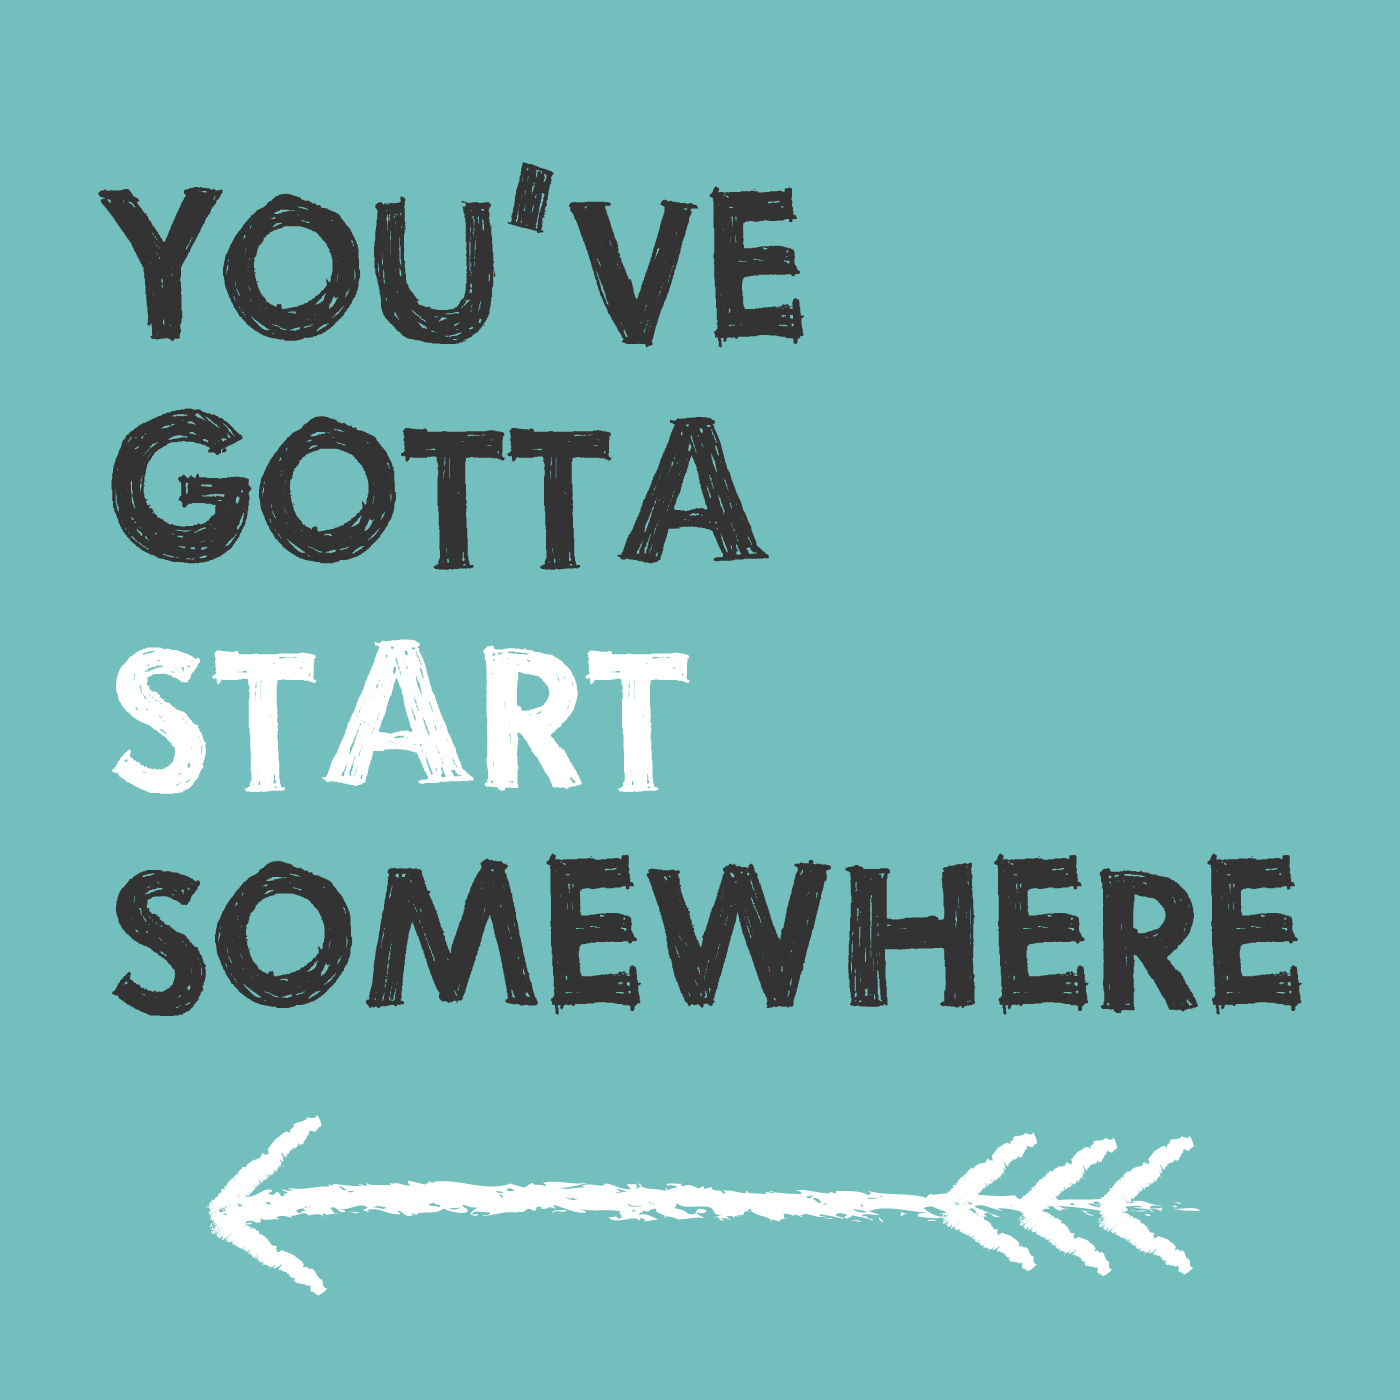 You've+Gotta+Start+Somewhere.jpg